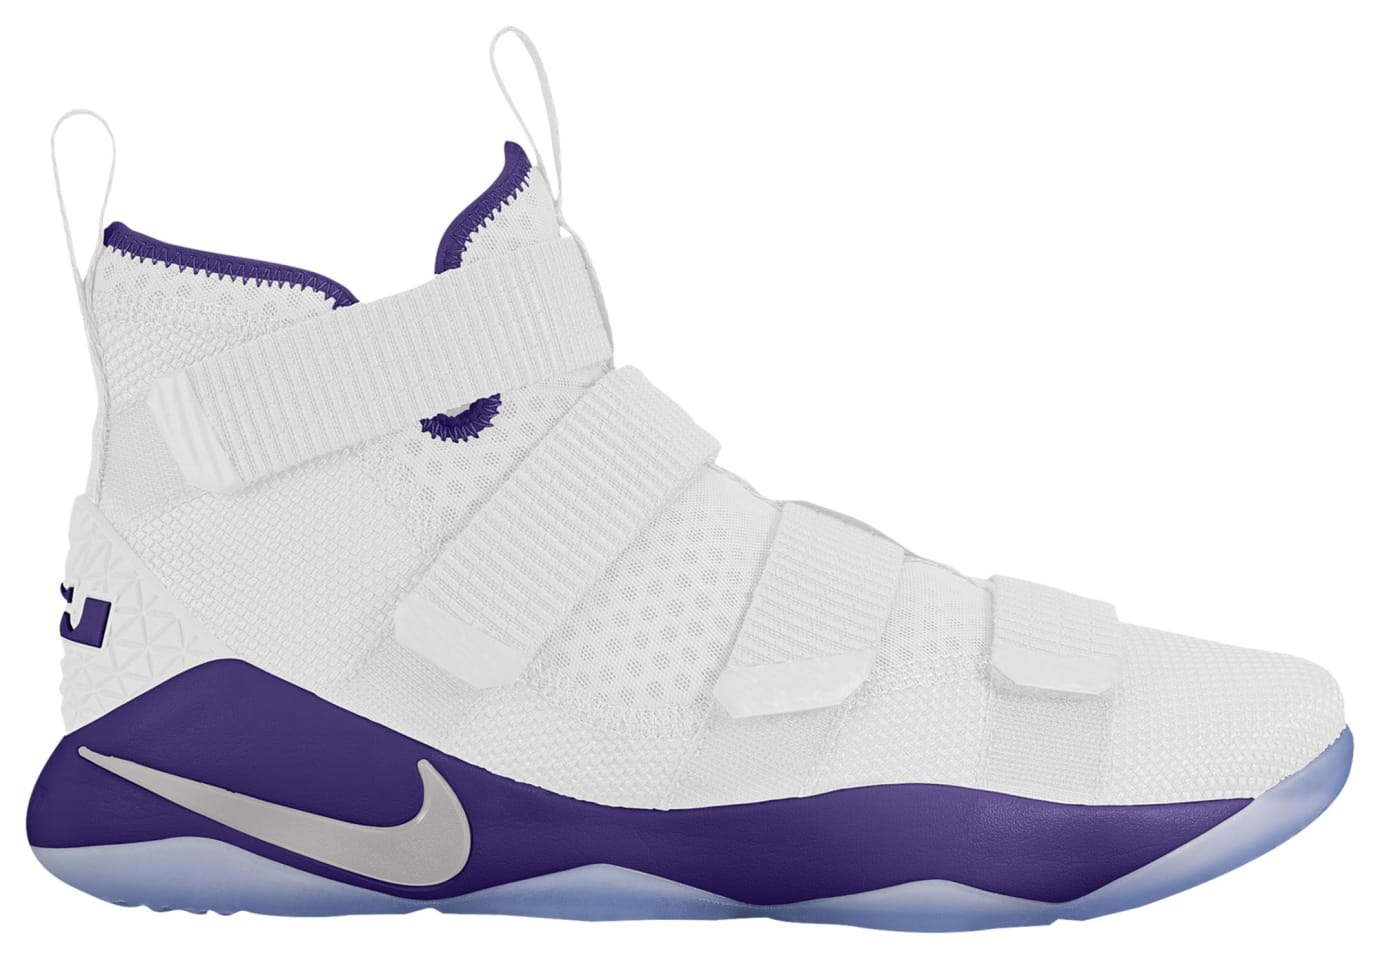 Nike LeBron Soldier 11 TB White Purple